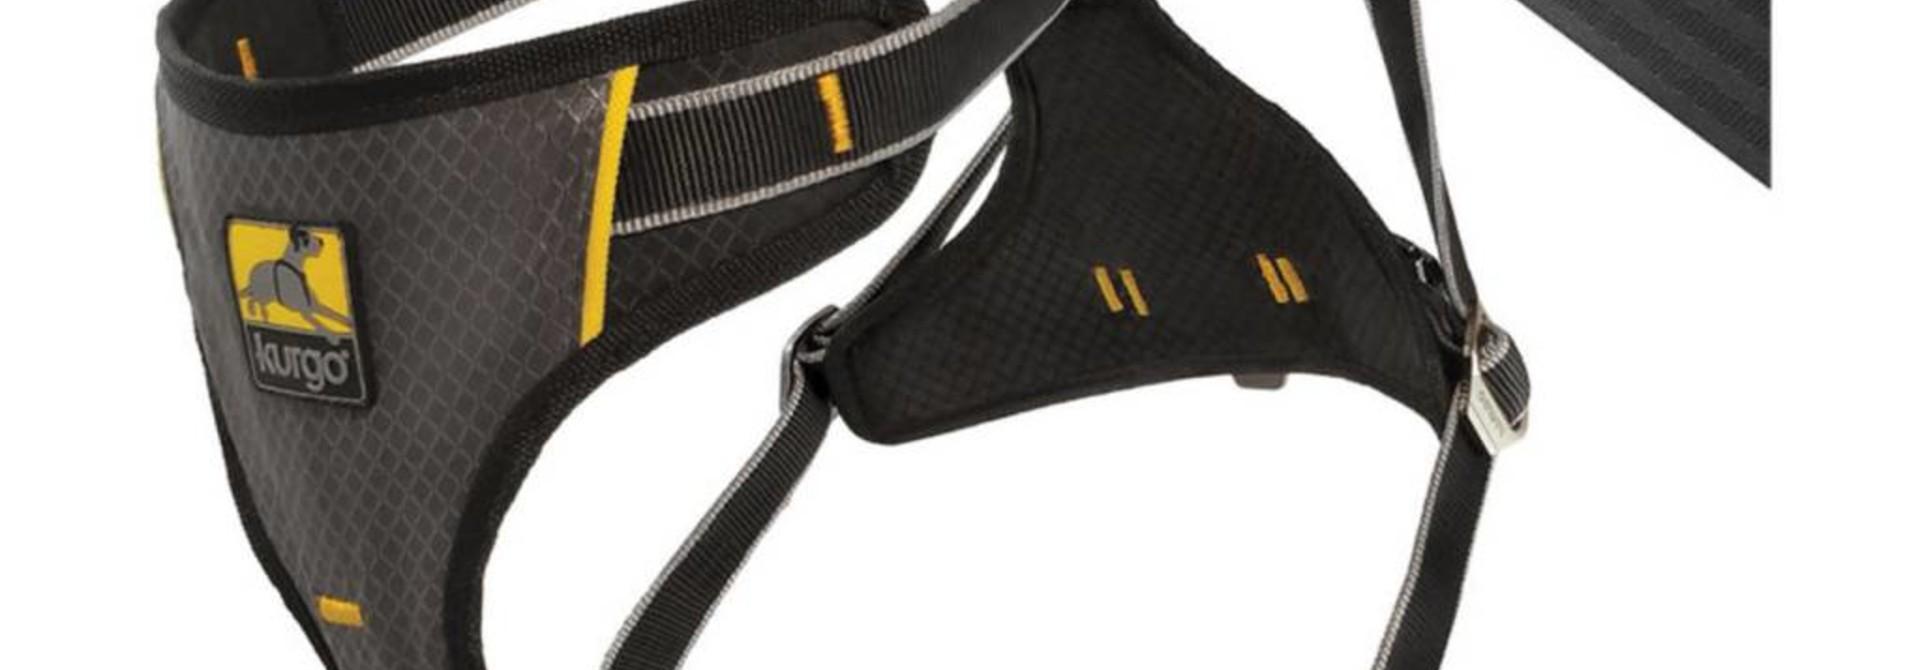 Kurgo Impact Seatbelt Harness-Small-Black